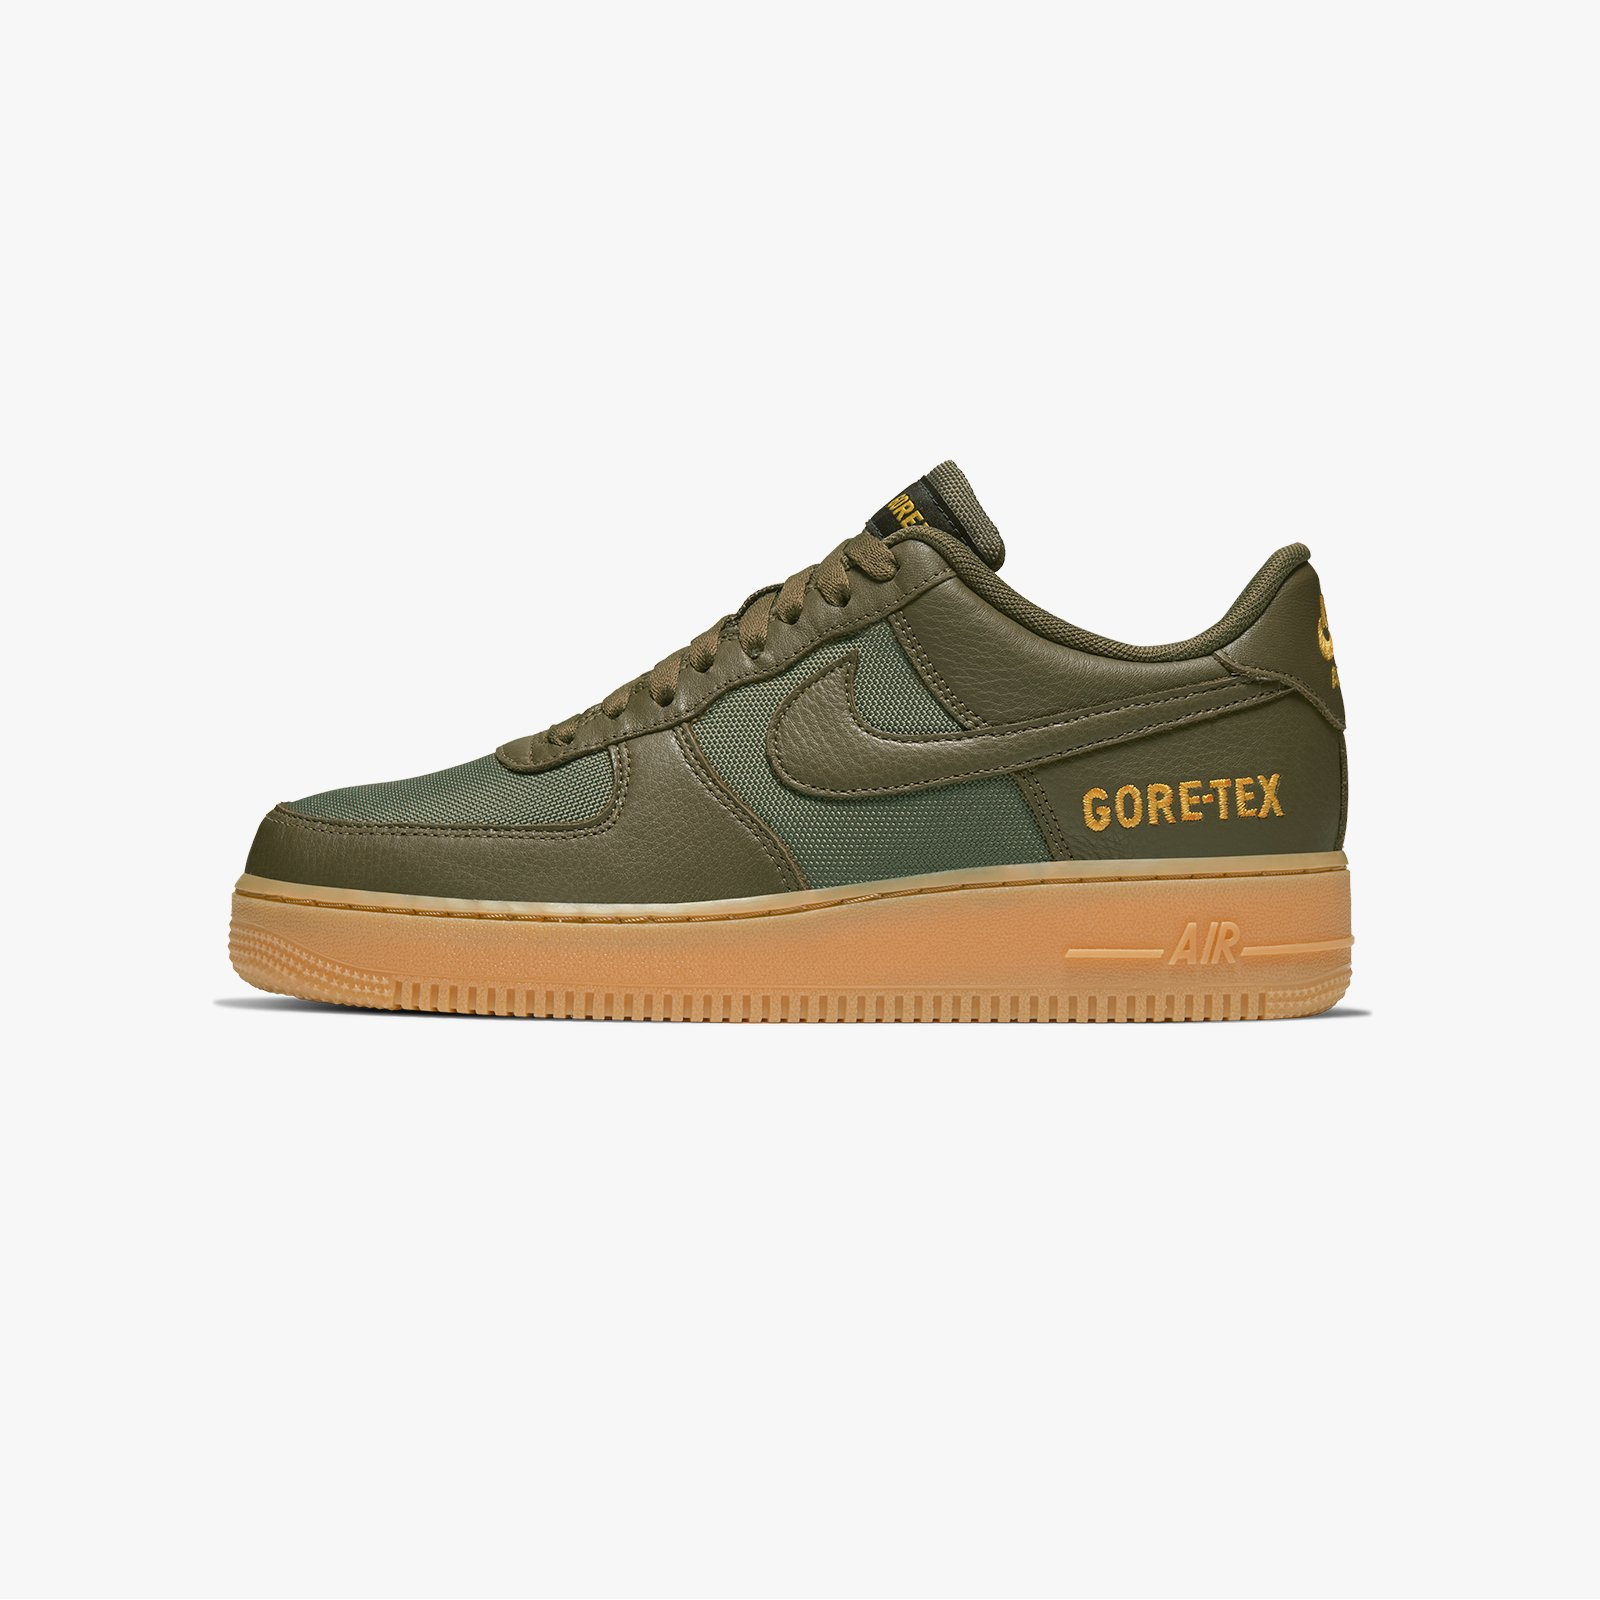 Nike Air Force 1 GTX Ck2630 200 Sneakersnstuff